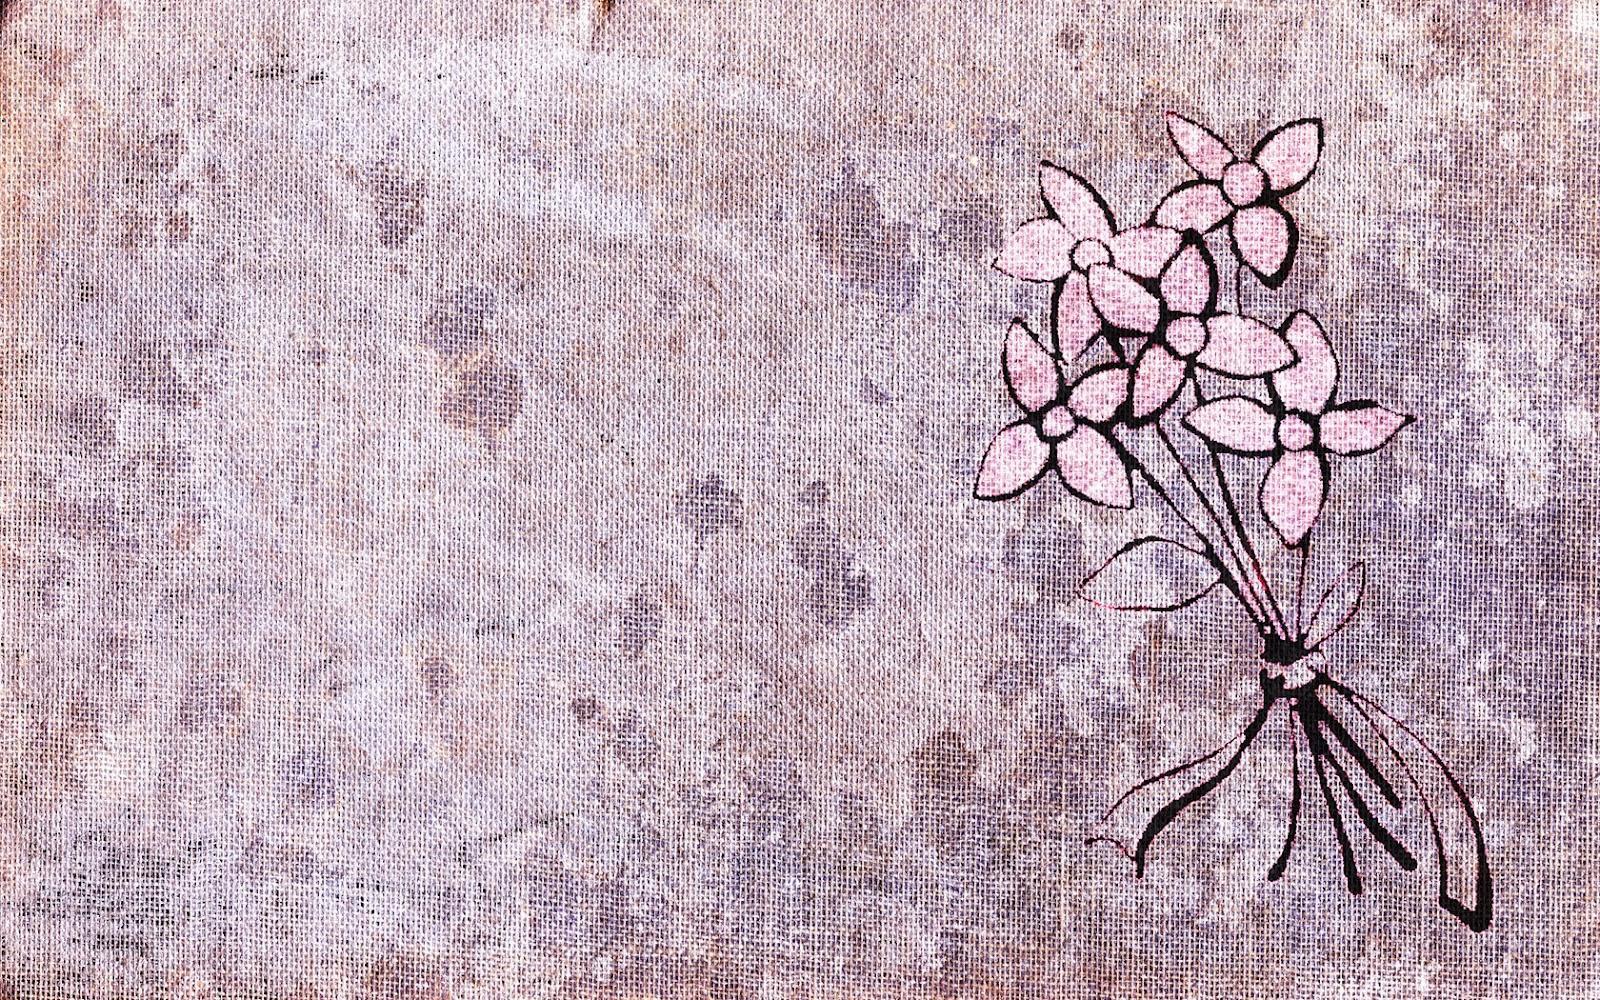 Flower tumblr backgrounds HD Wallpaper 1600x1000